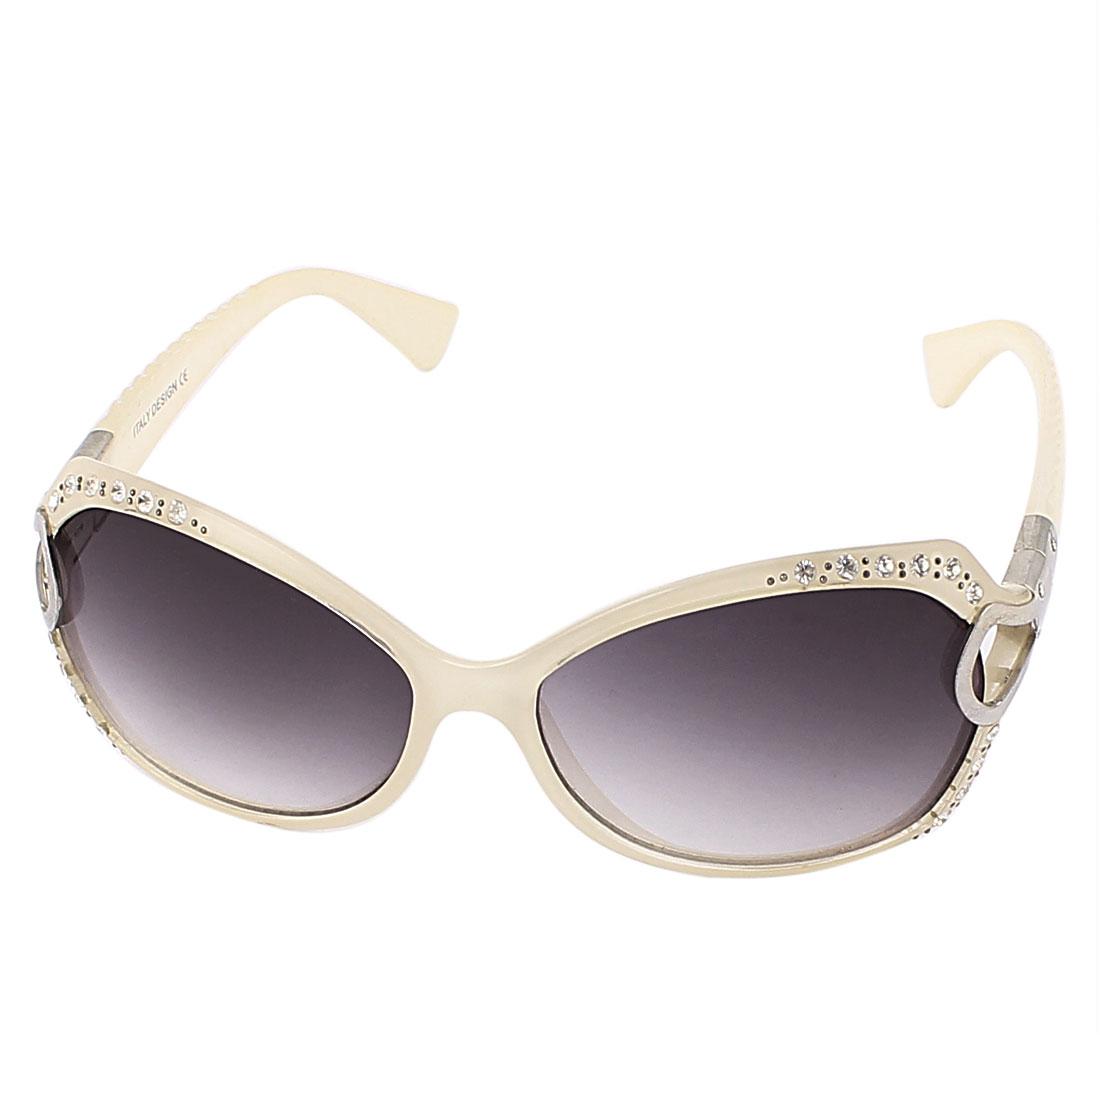 Lady Rhinestone Decor Full Frame Sunglasses Shield Eyeglasses Eyewear